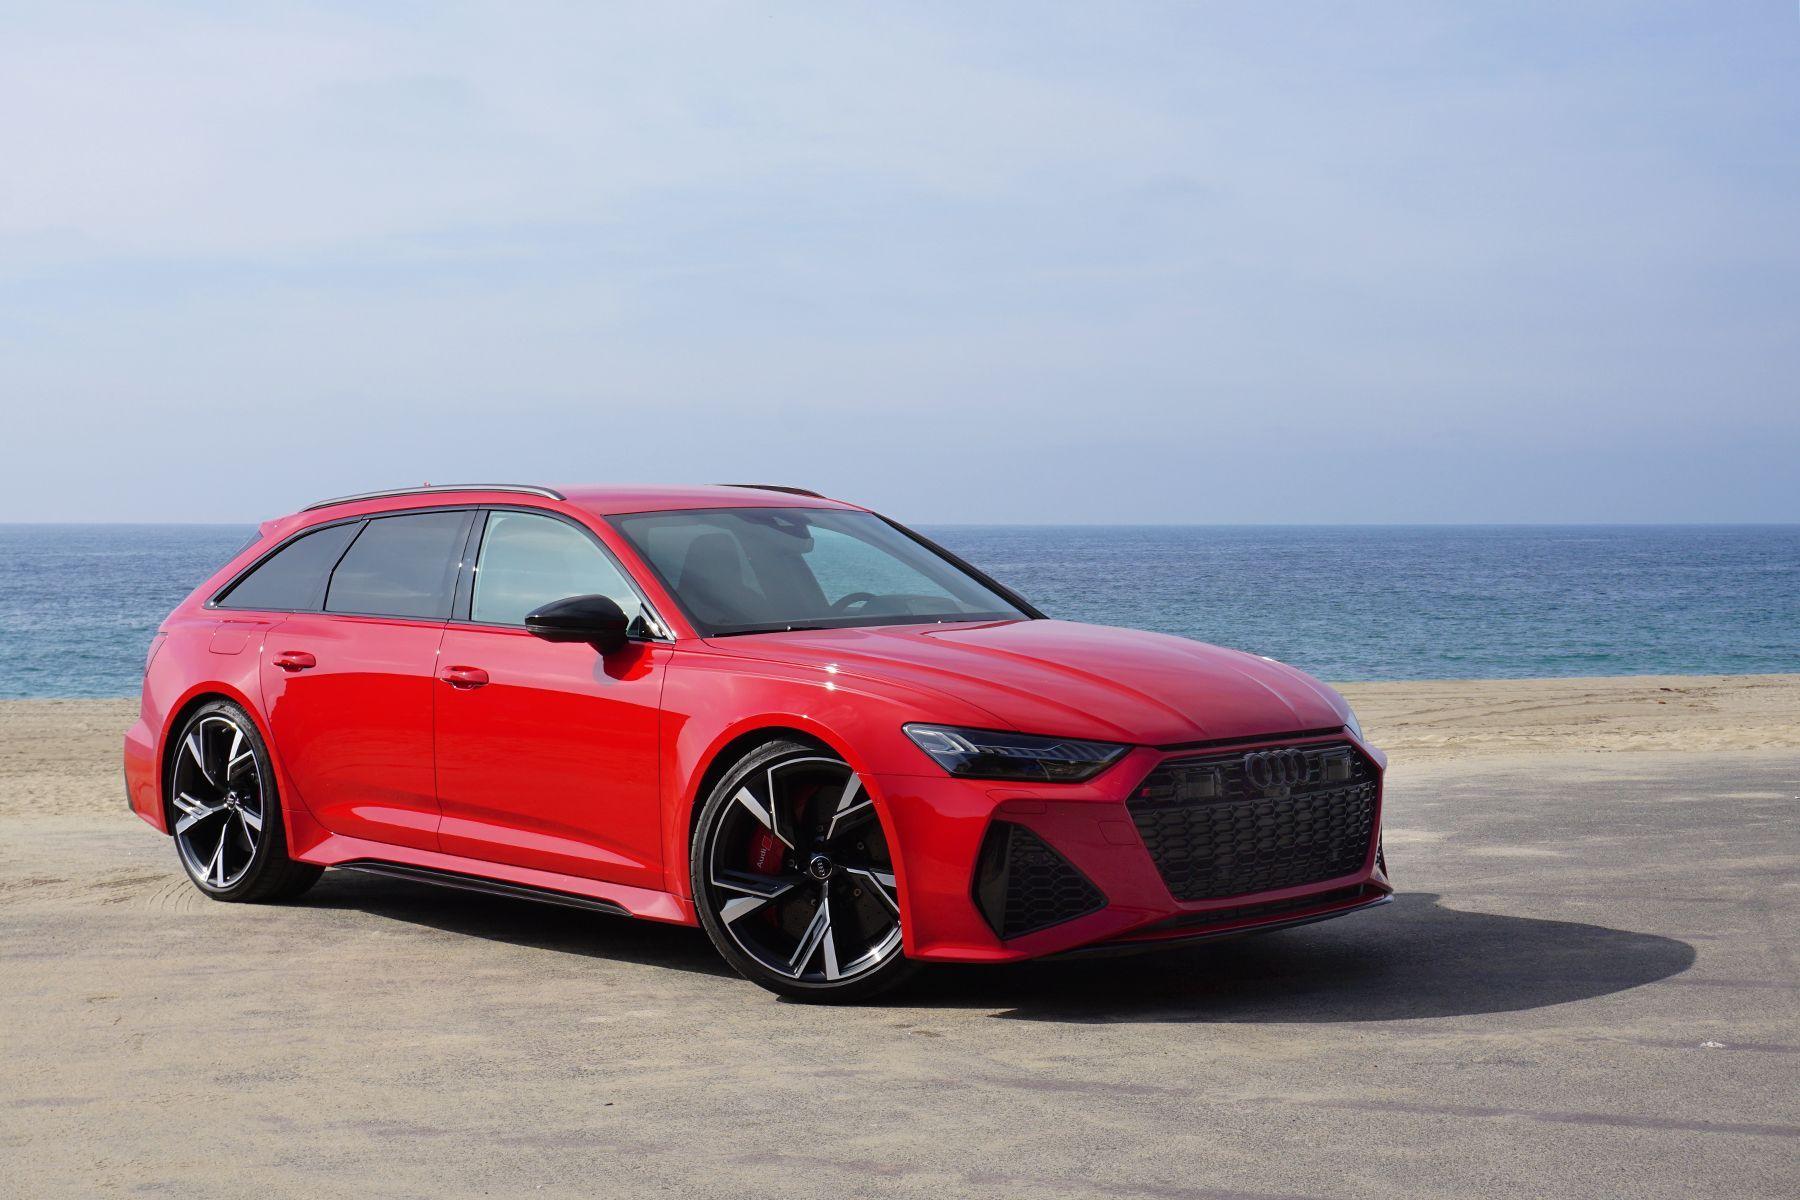 First Drive: 2021 Audi RS 6 Avant | Audi rs, Audi rs5, Audi